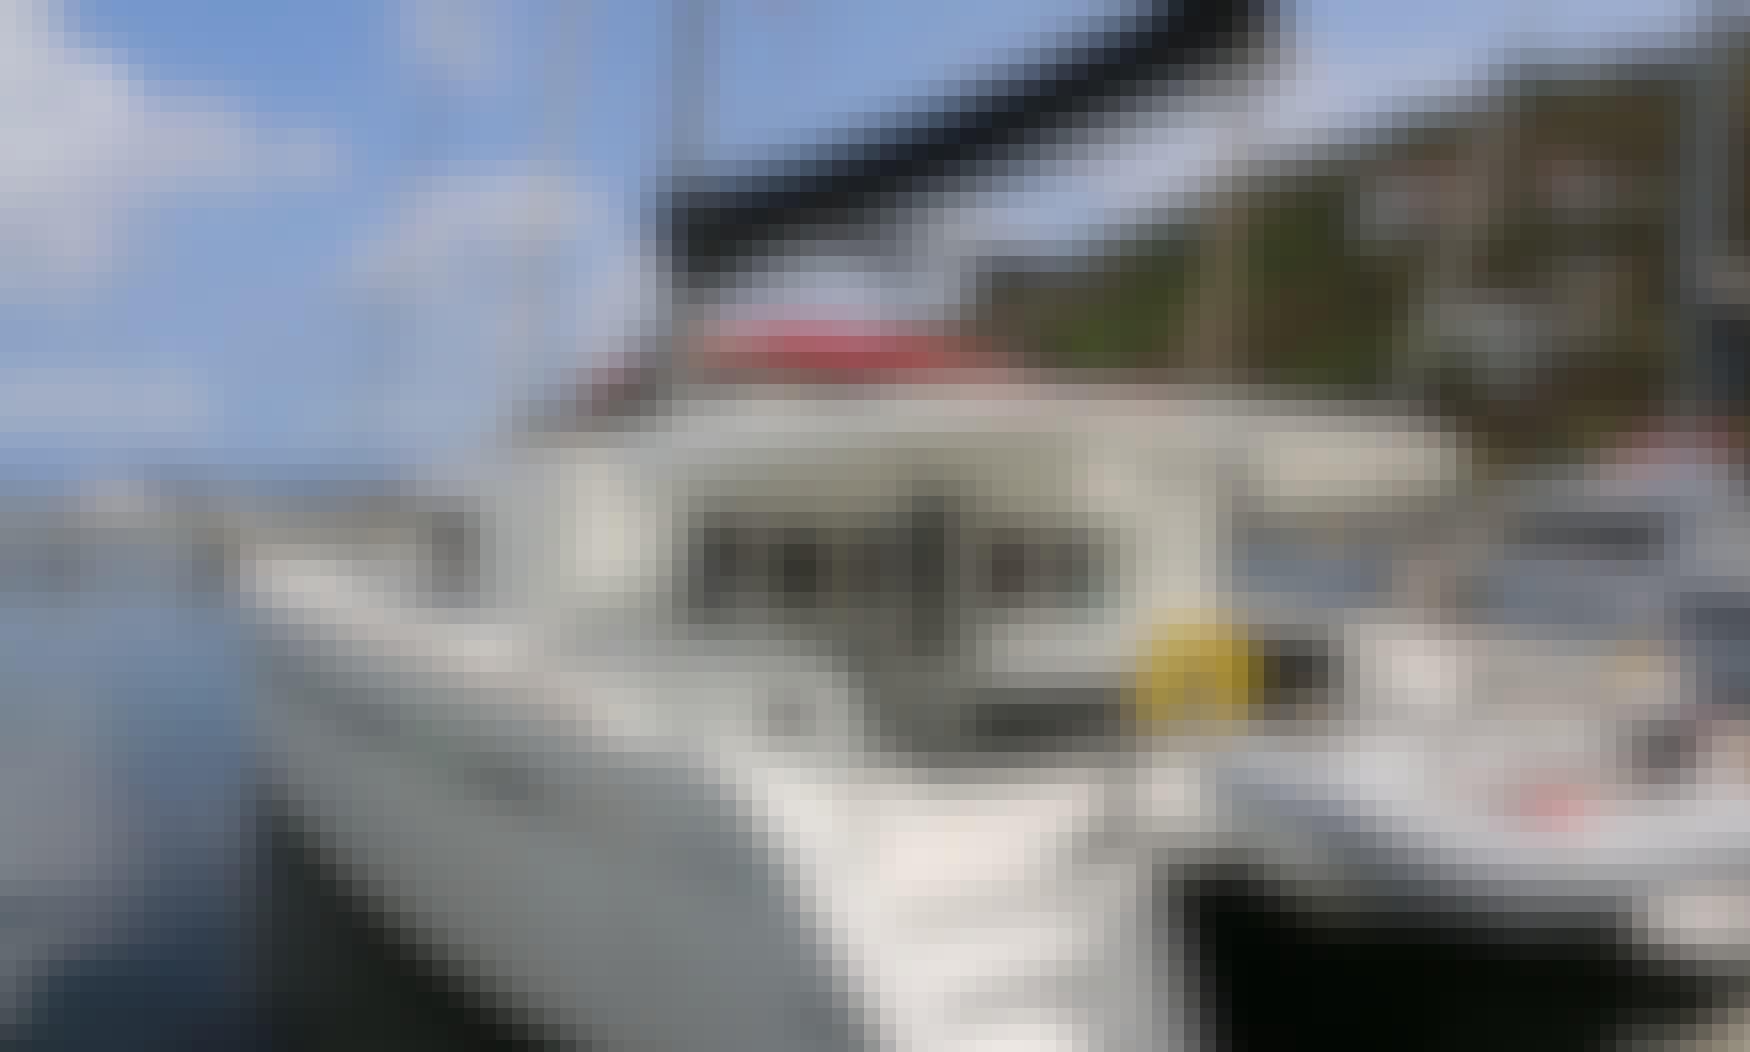 Lagoon 450 Cruising Catamaran for 12 Person in Tortola, British Virgin Islands!